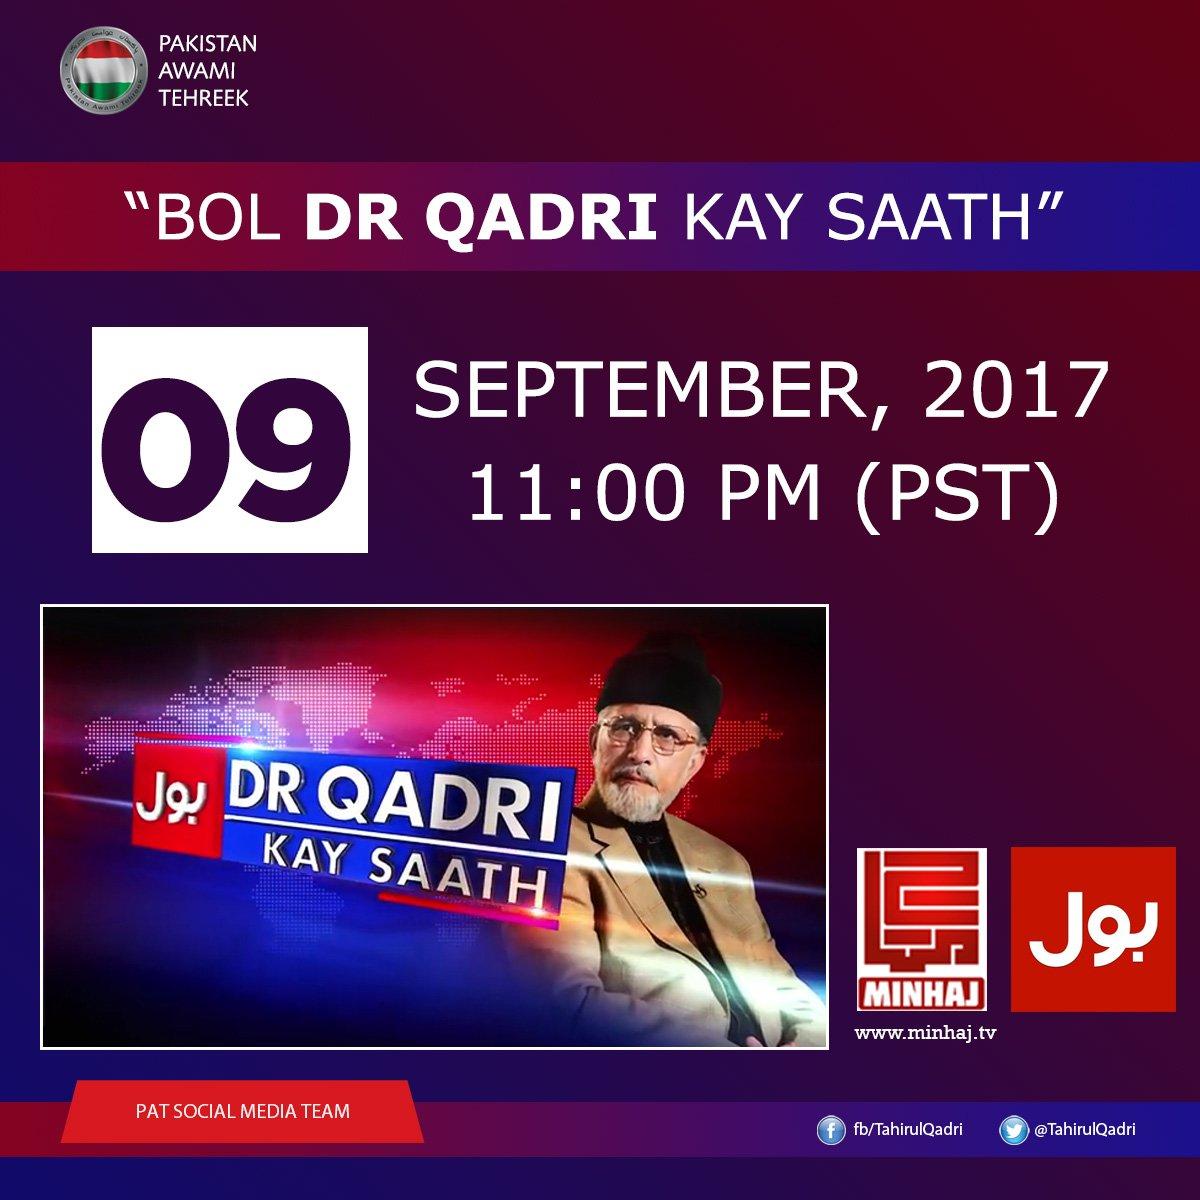 Watch Dr Tahir-ul-Qadri in progrm 'BOL Dr Qadri Kay Saath' on BOL News | Saturday, 09 September, at 11:00 PM